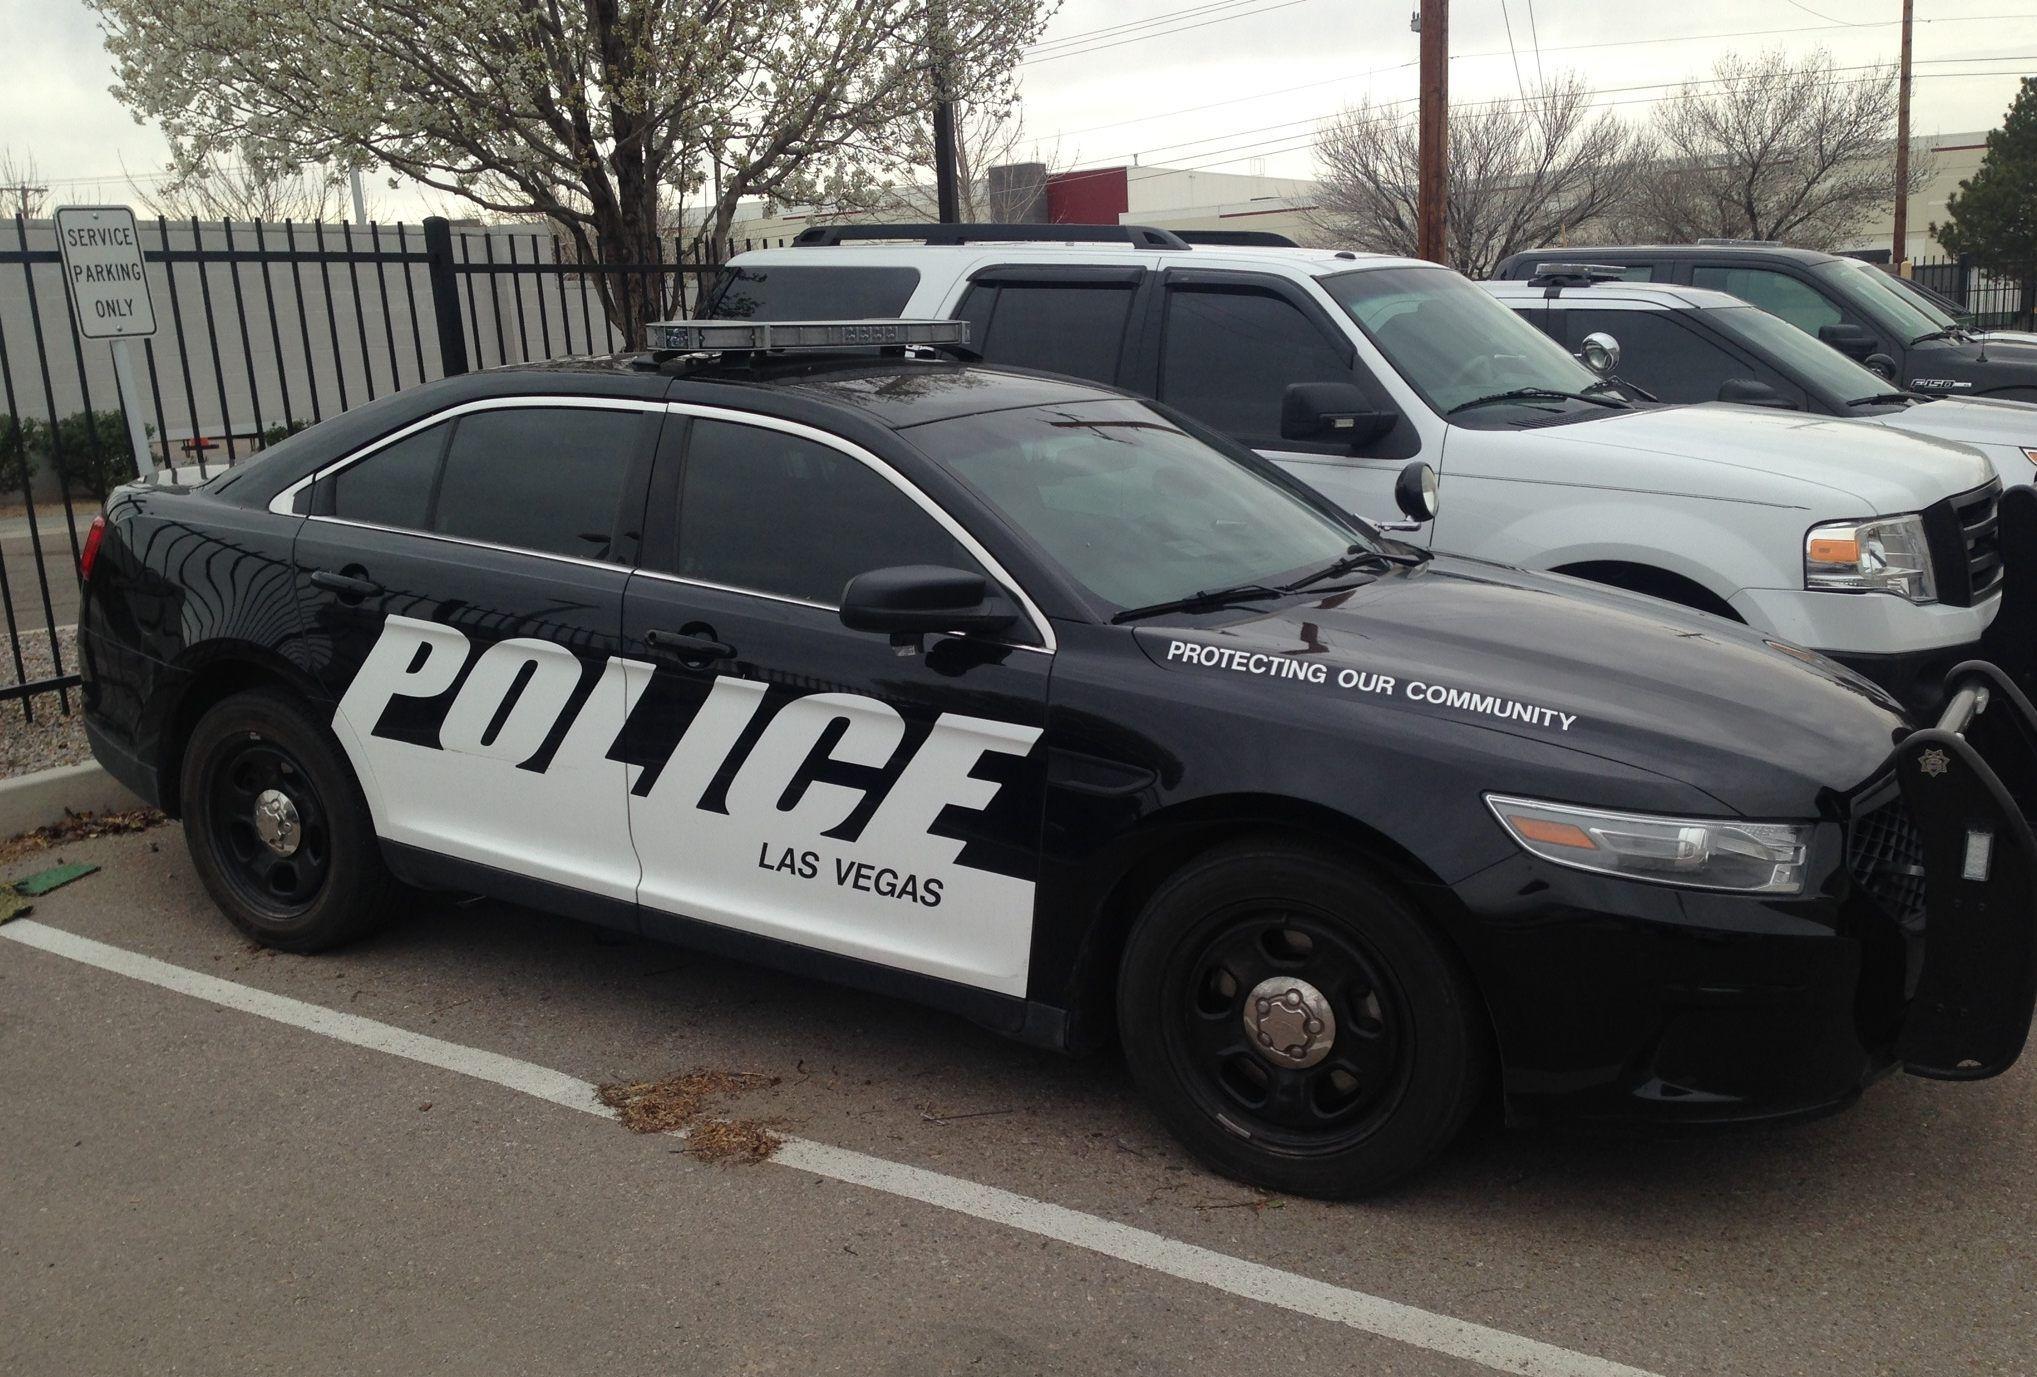 Las Vegas Police 0229 Police Emergency Vehicles Police Cars